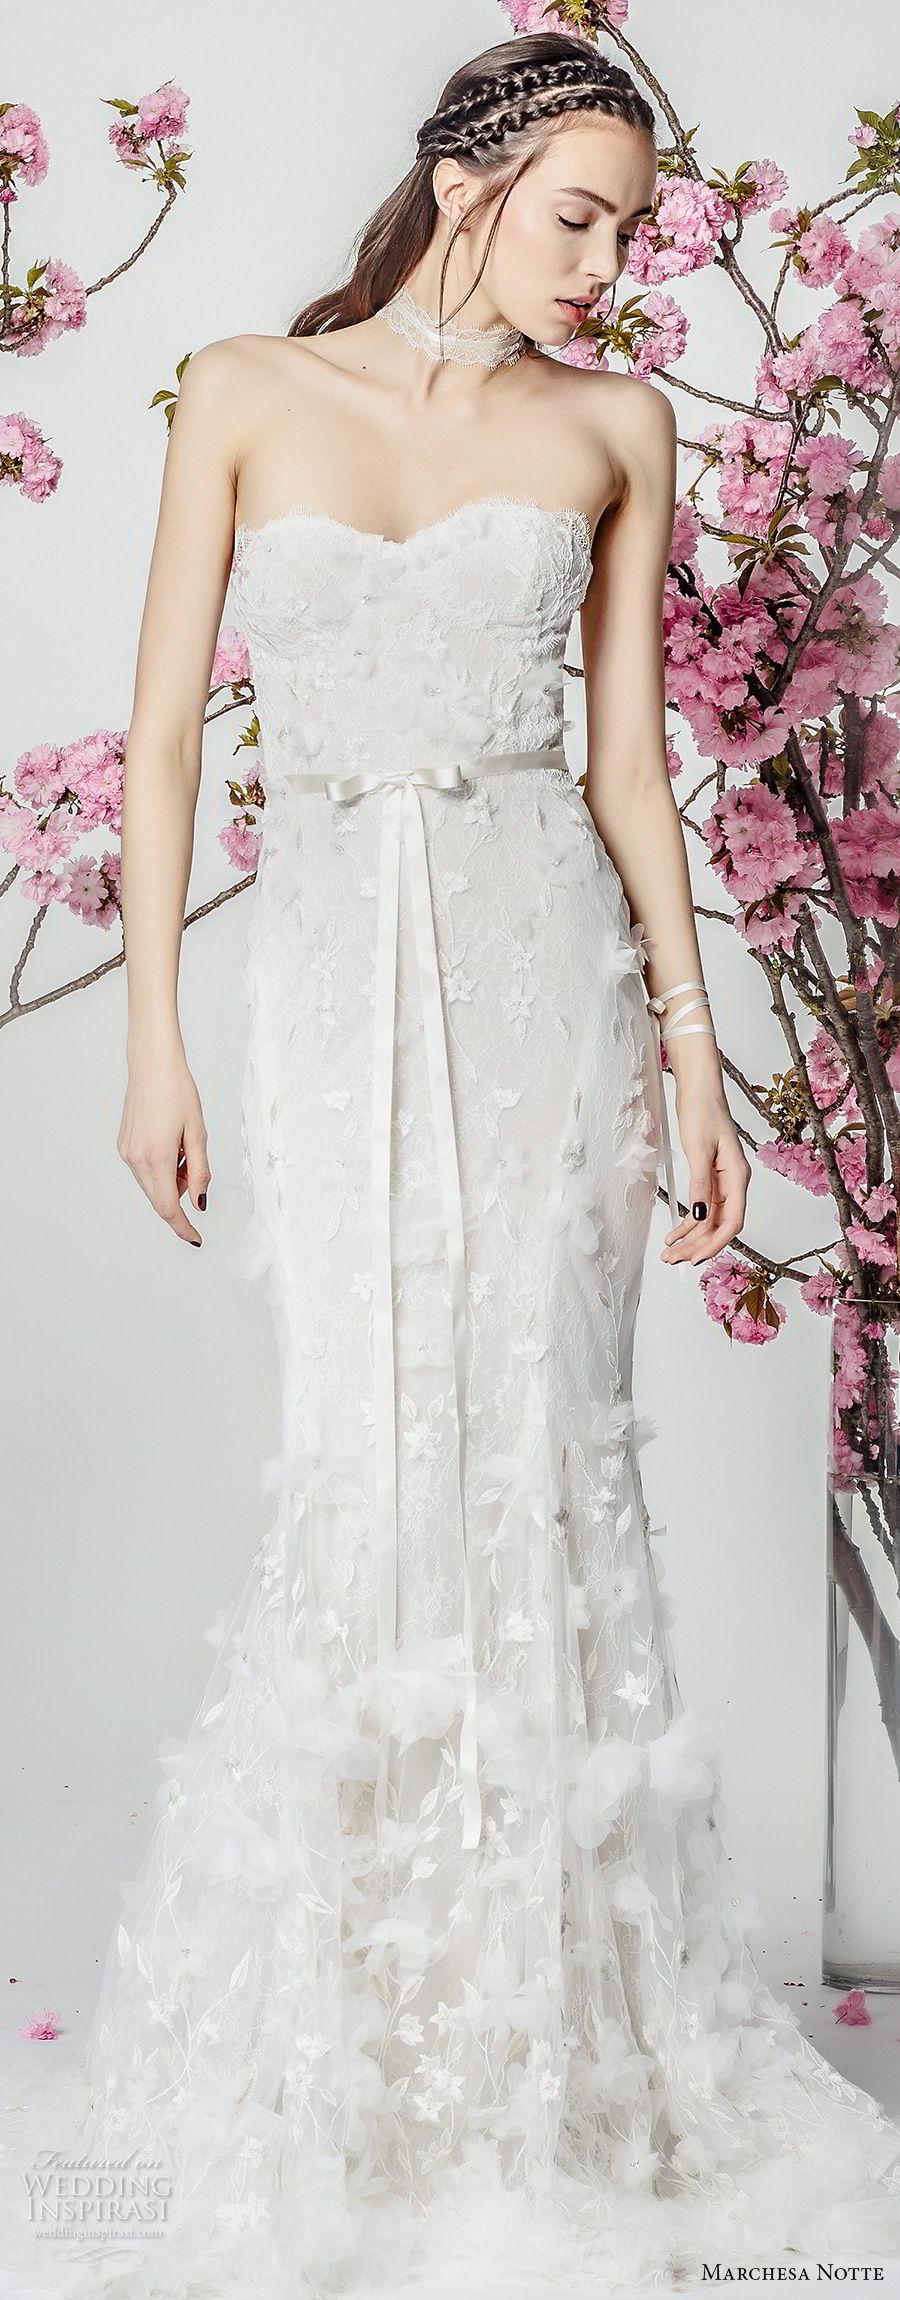 Marchesa Notte Spring 2018 Wedding Dresses Wedding Inspirasi